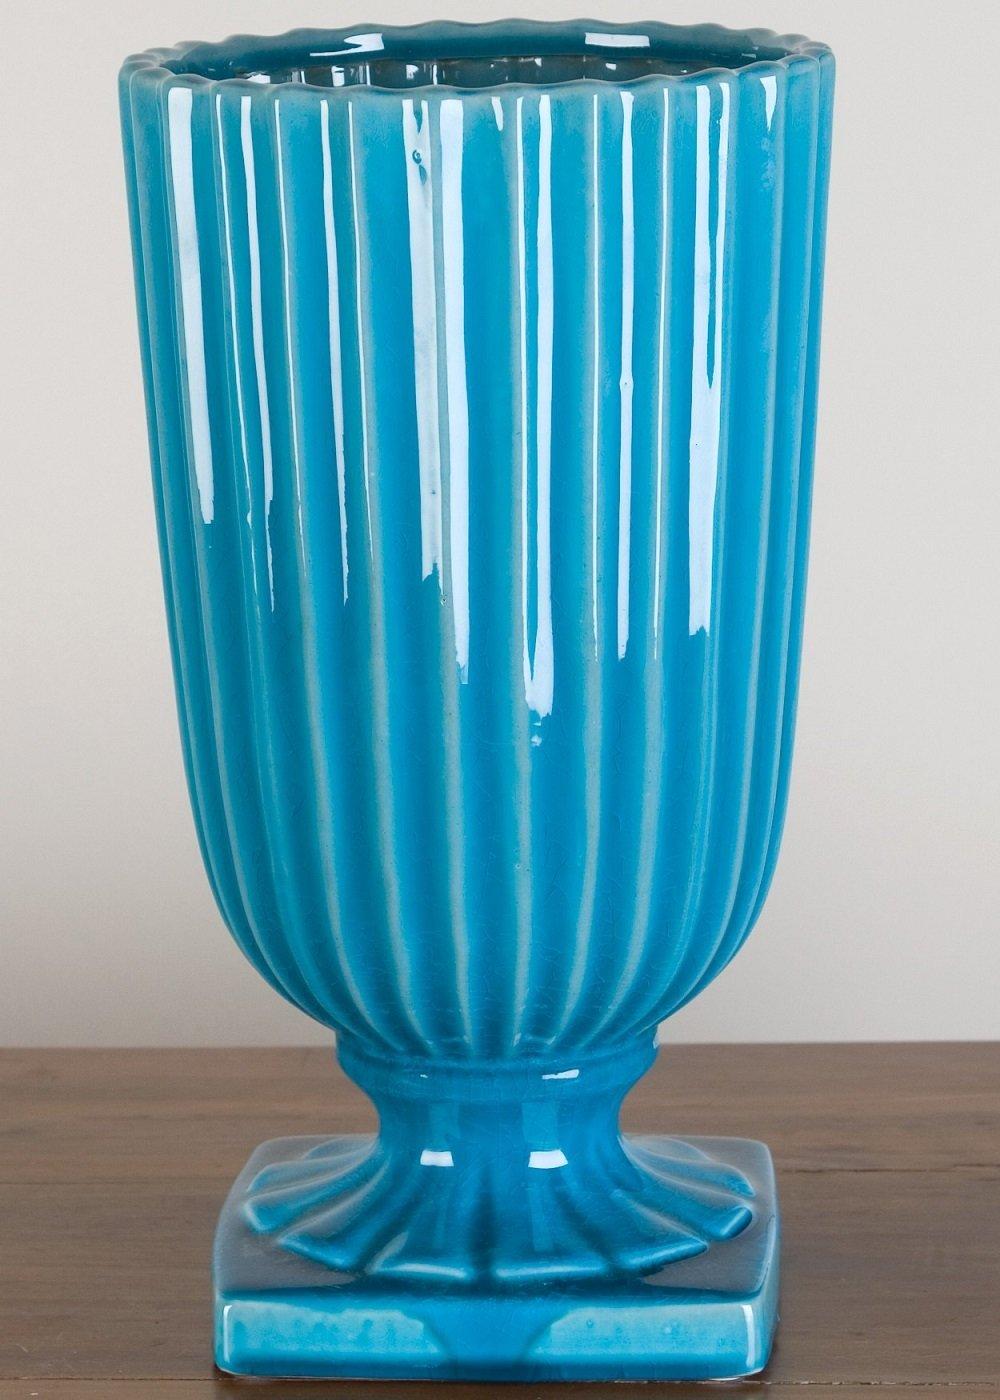 Home decor. Sea Green Vase. Dimension: 6 x 6 x 13. Pattern: Light Sea Green.